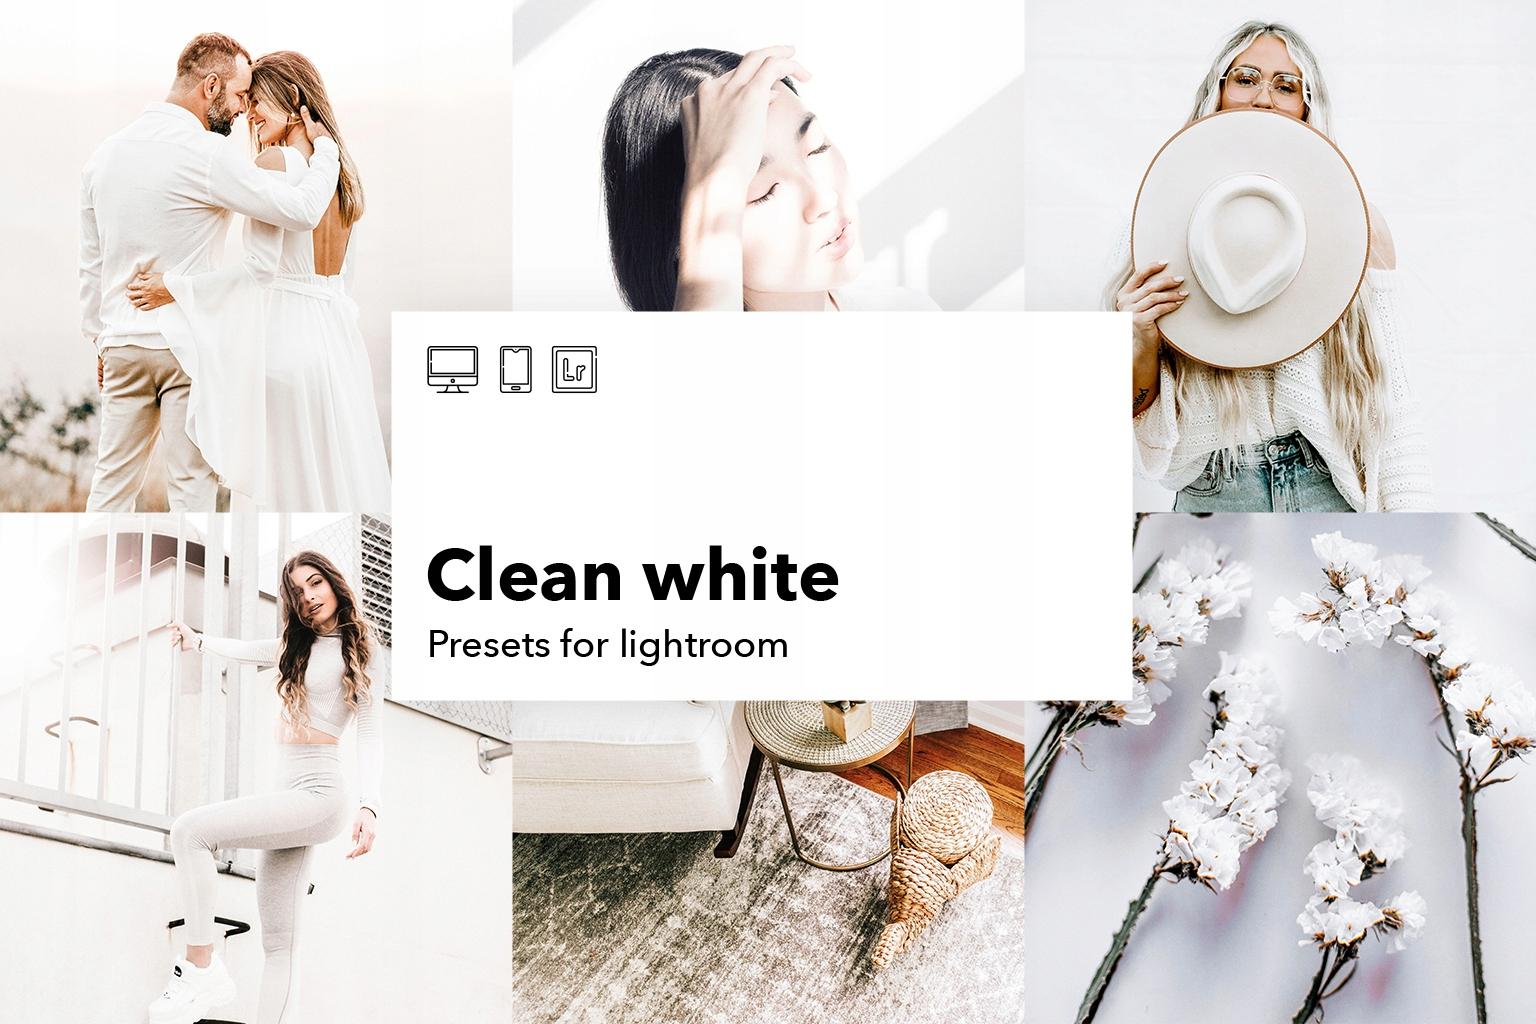 Item Presets lightroom - 5 filters in Clean White